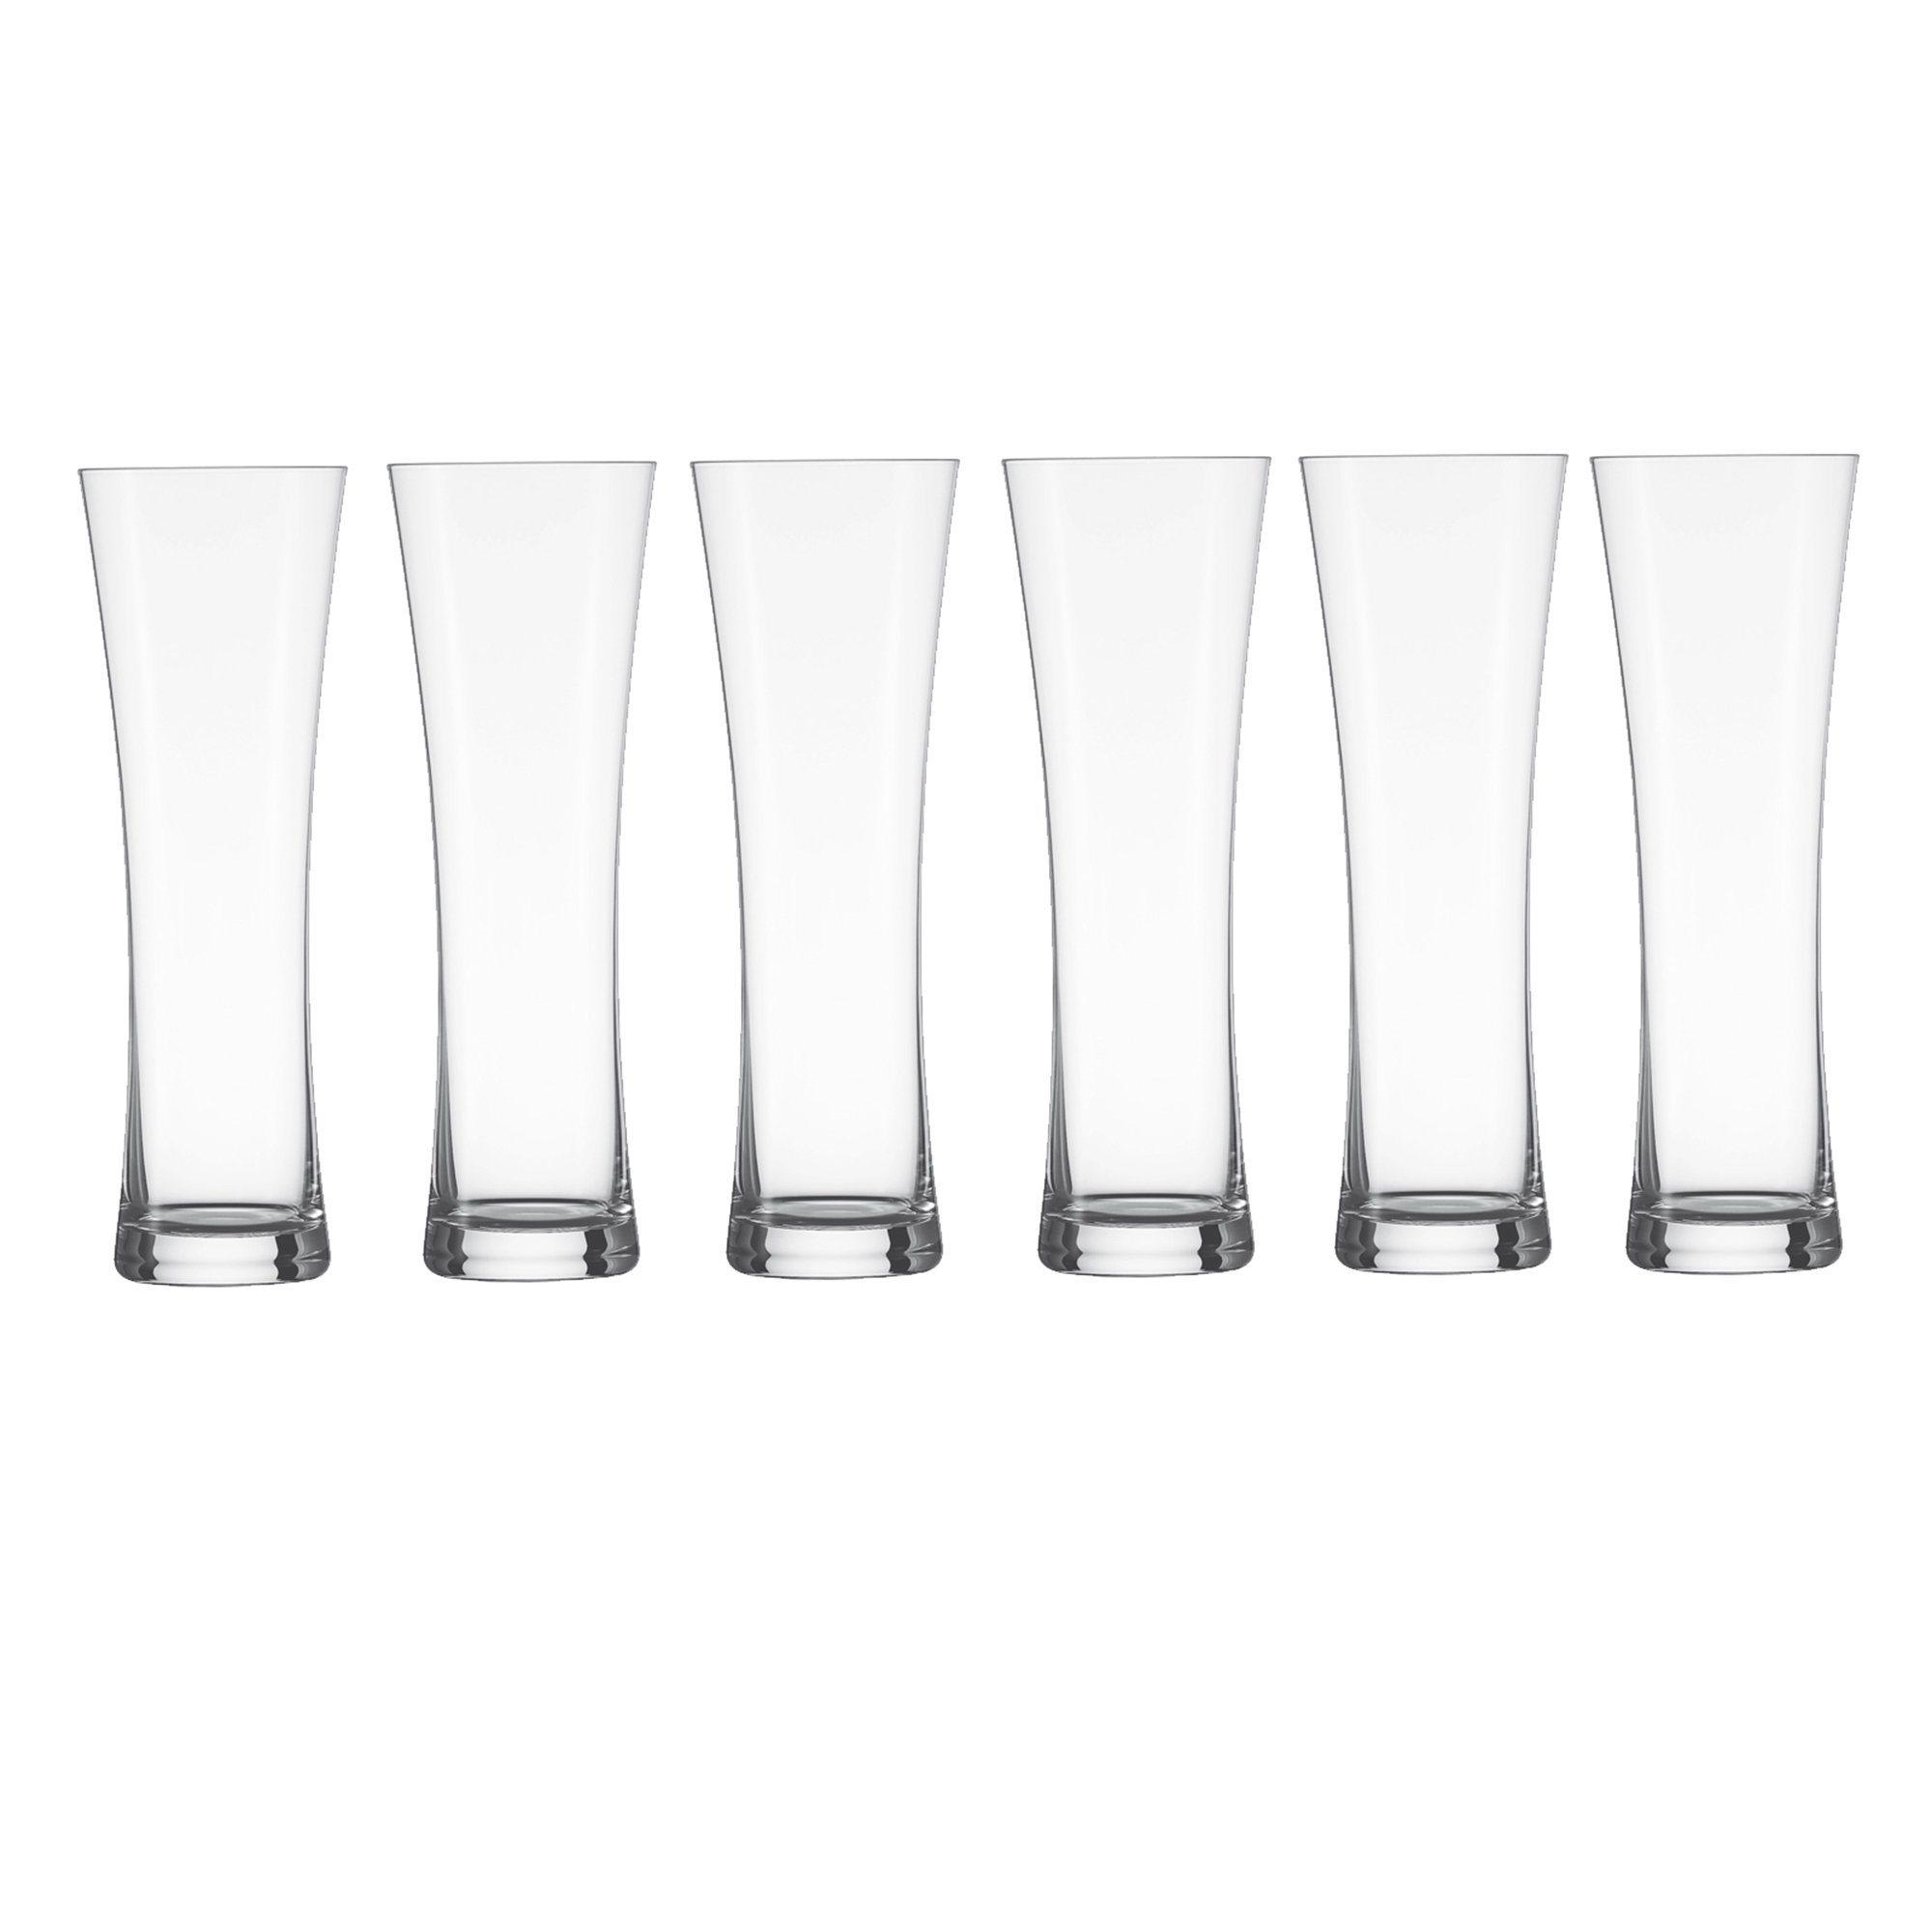 Weizenbierglas 6er-Set »Beer Basic«